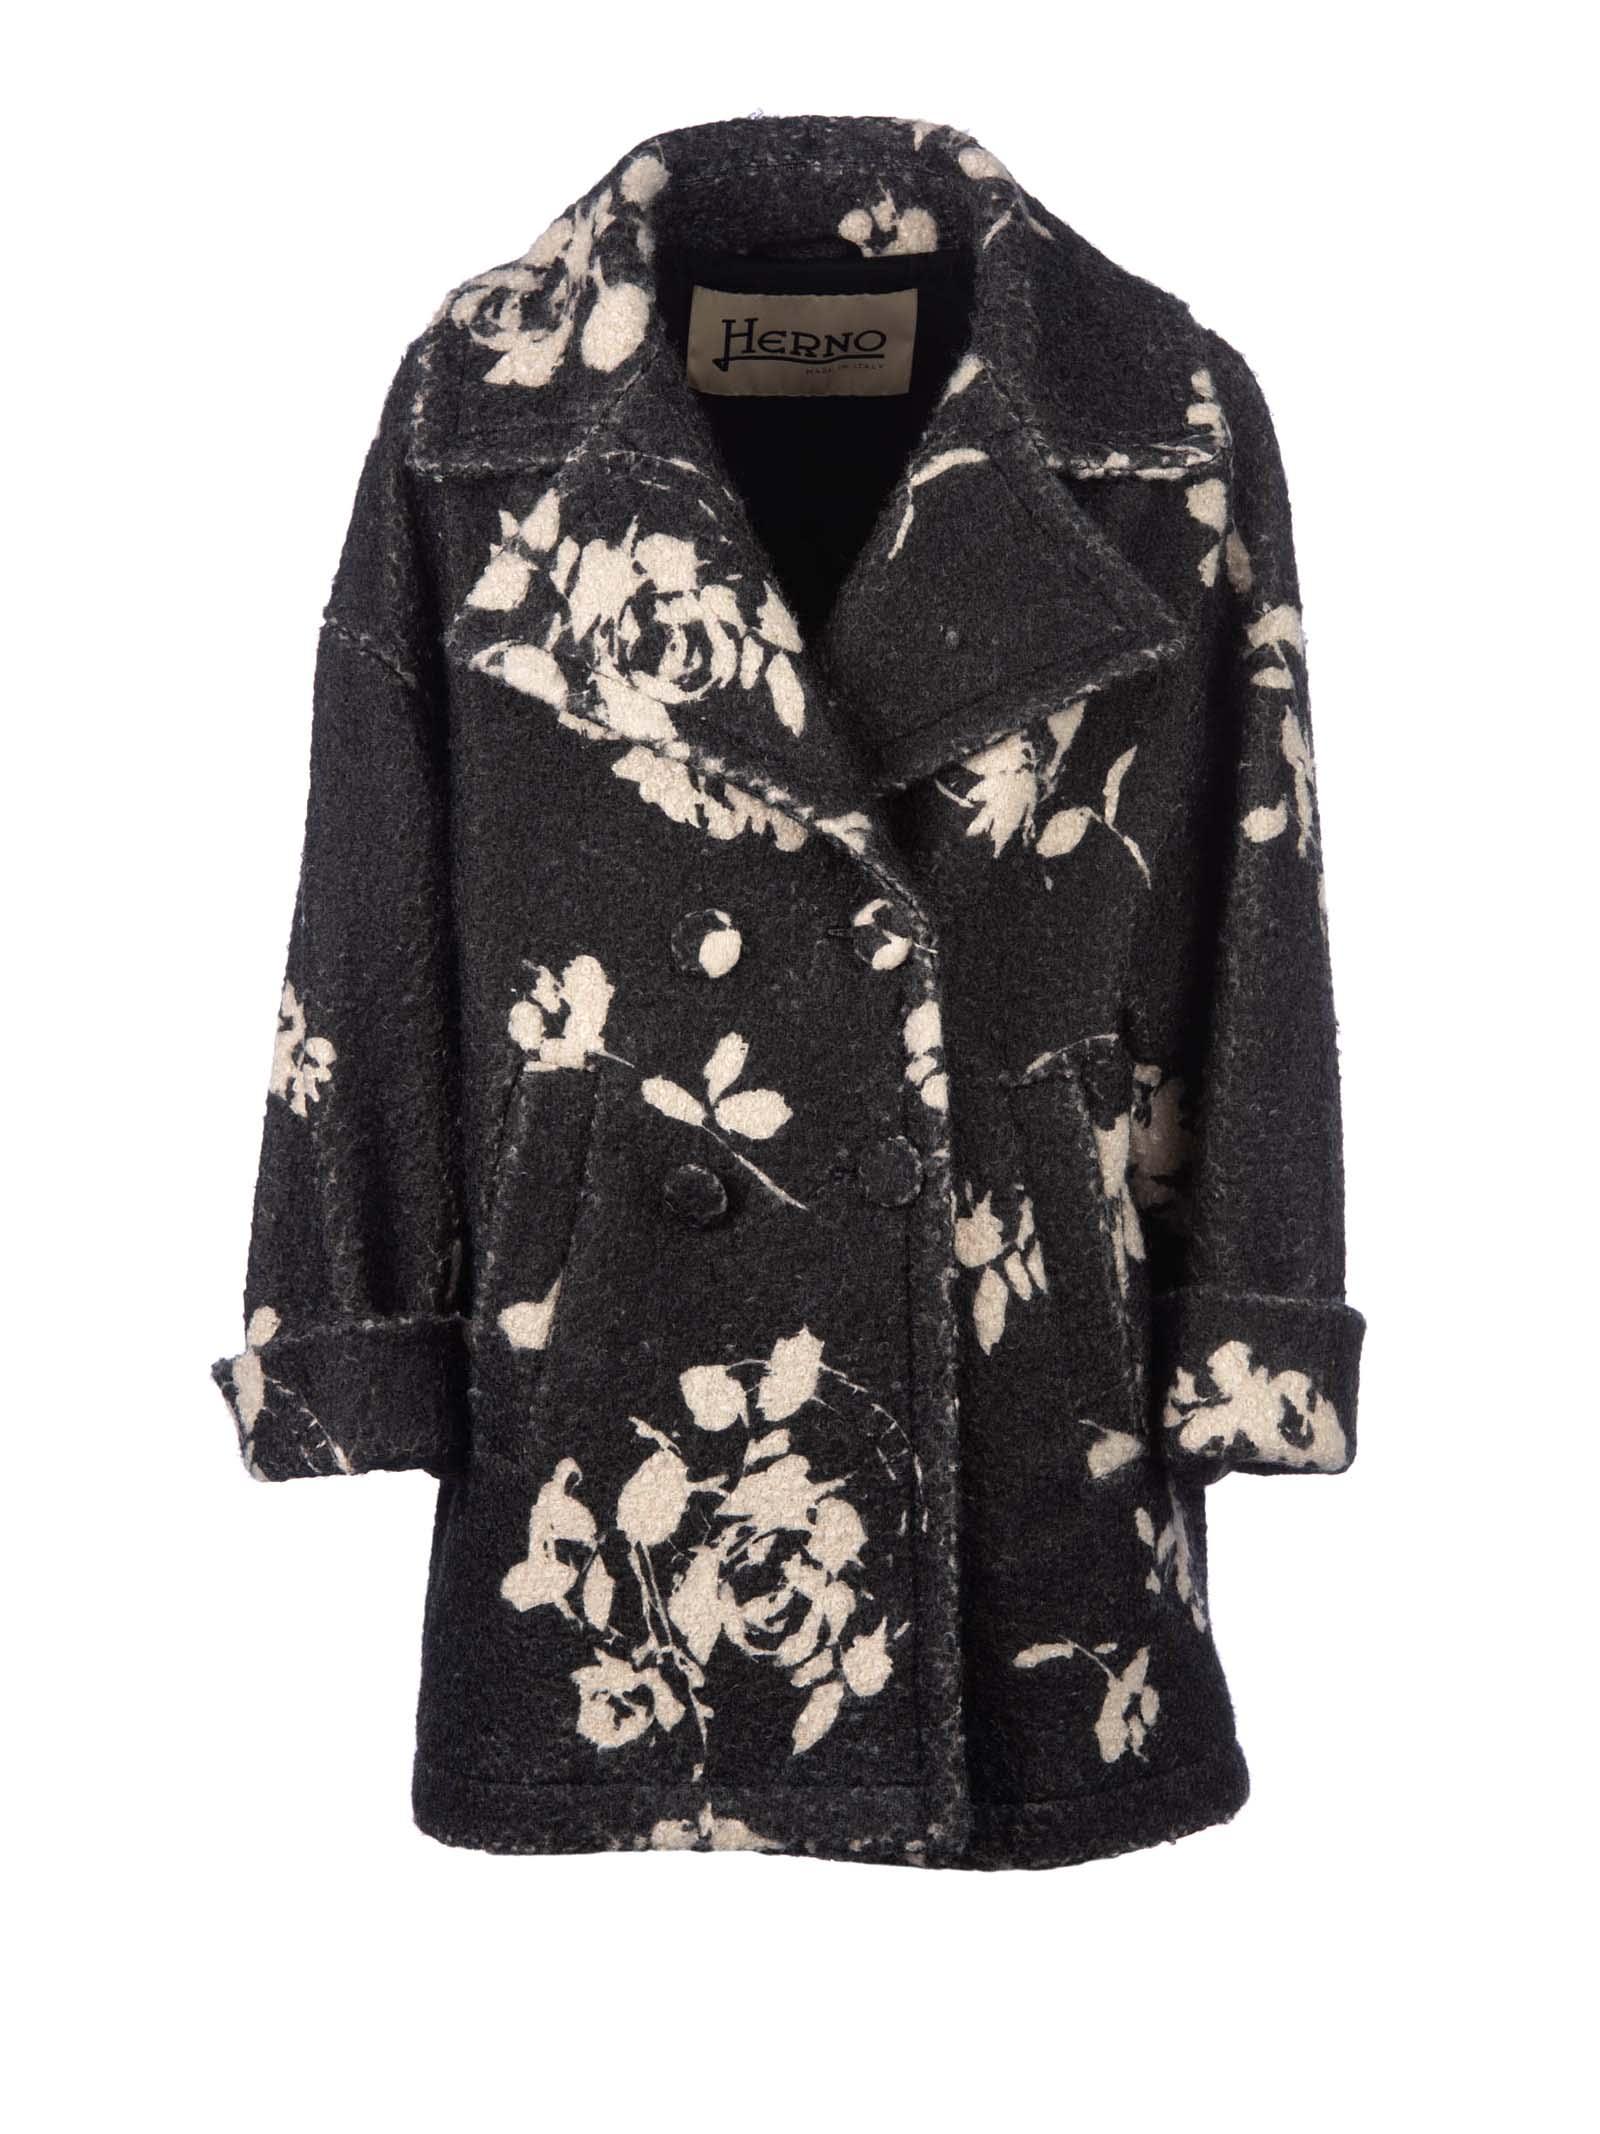 Herno Herno Printed Coat